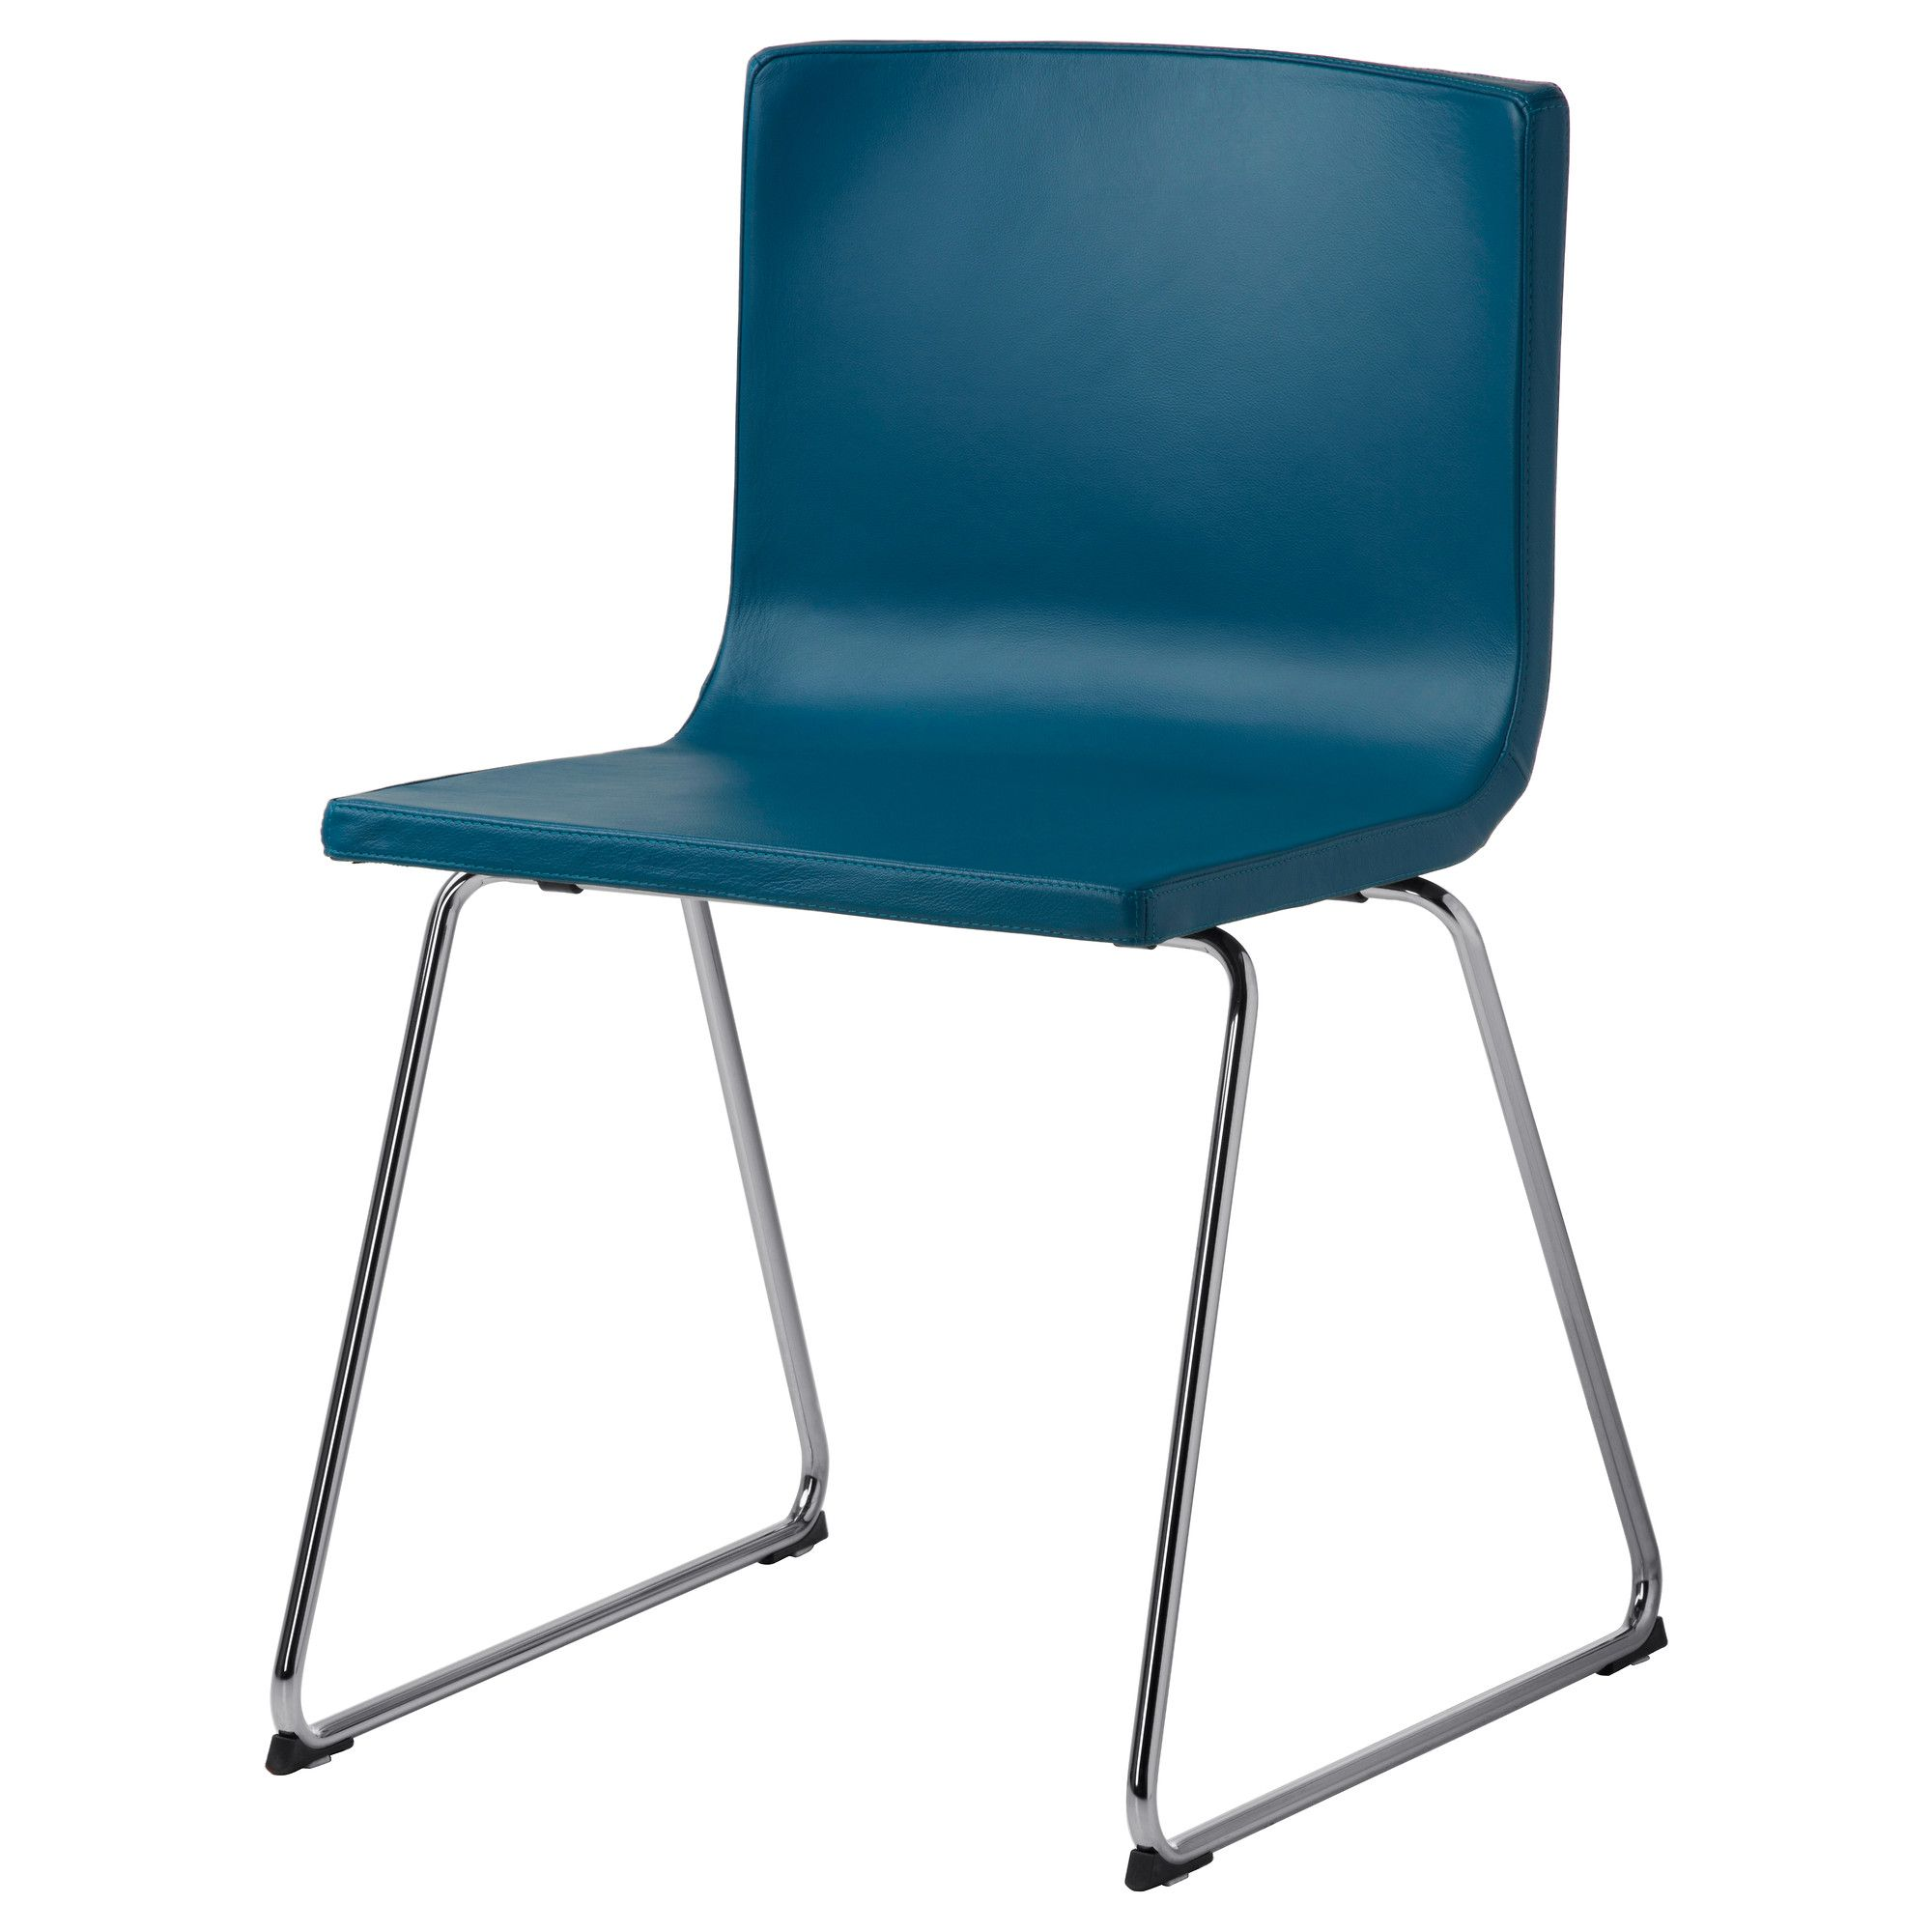 ikea dining chair wicker swing outdoor bernhard chrome plated kavat blue home